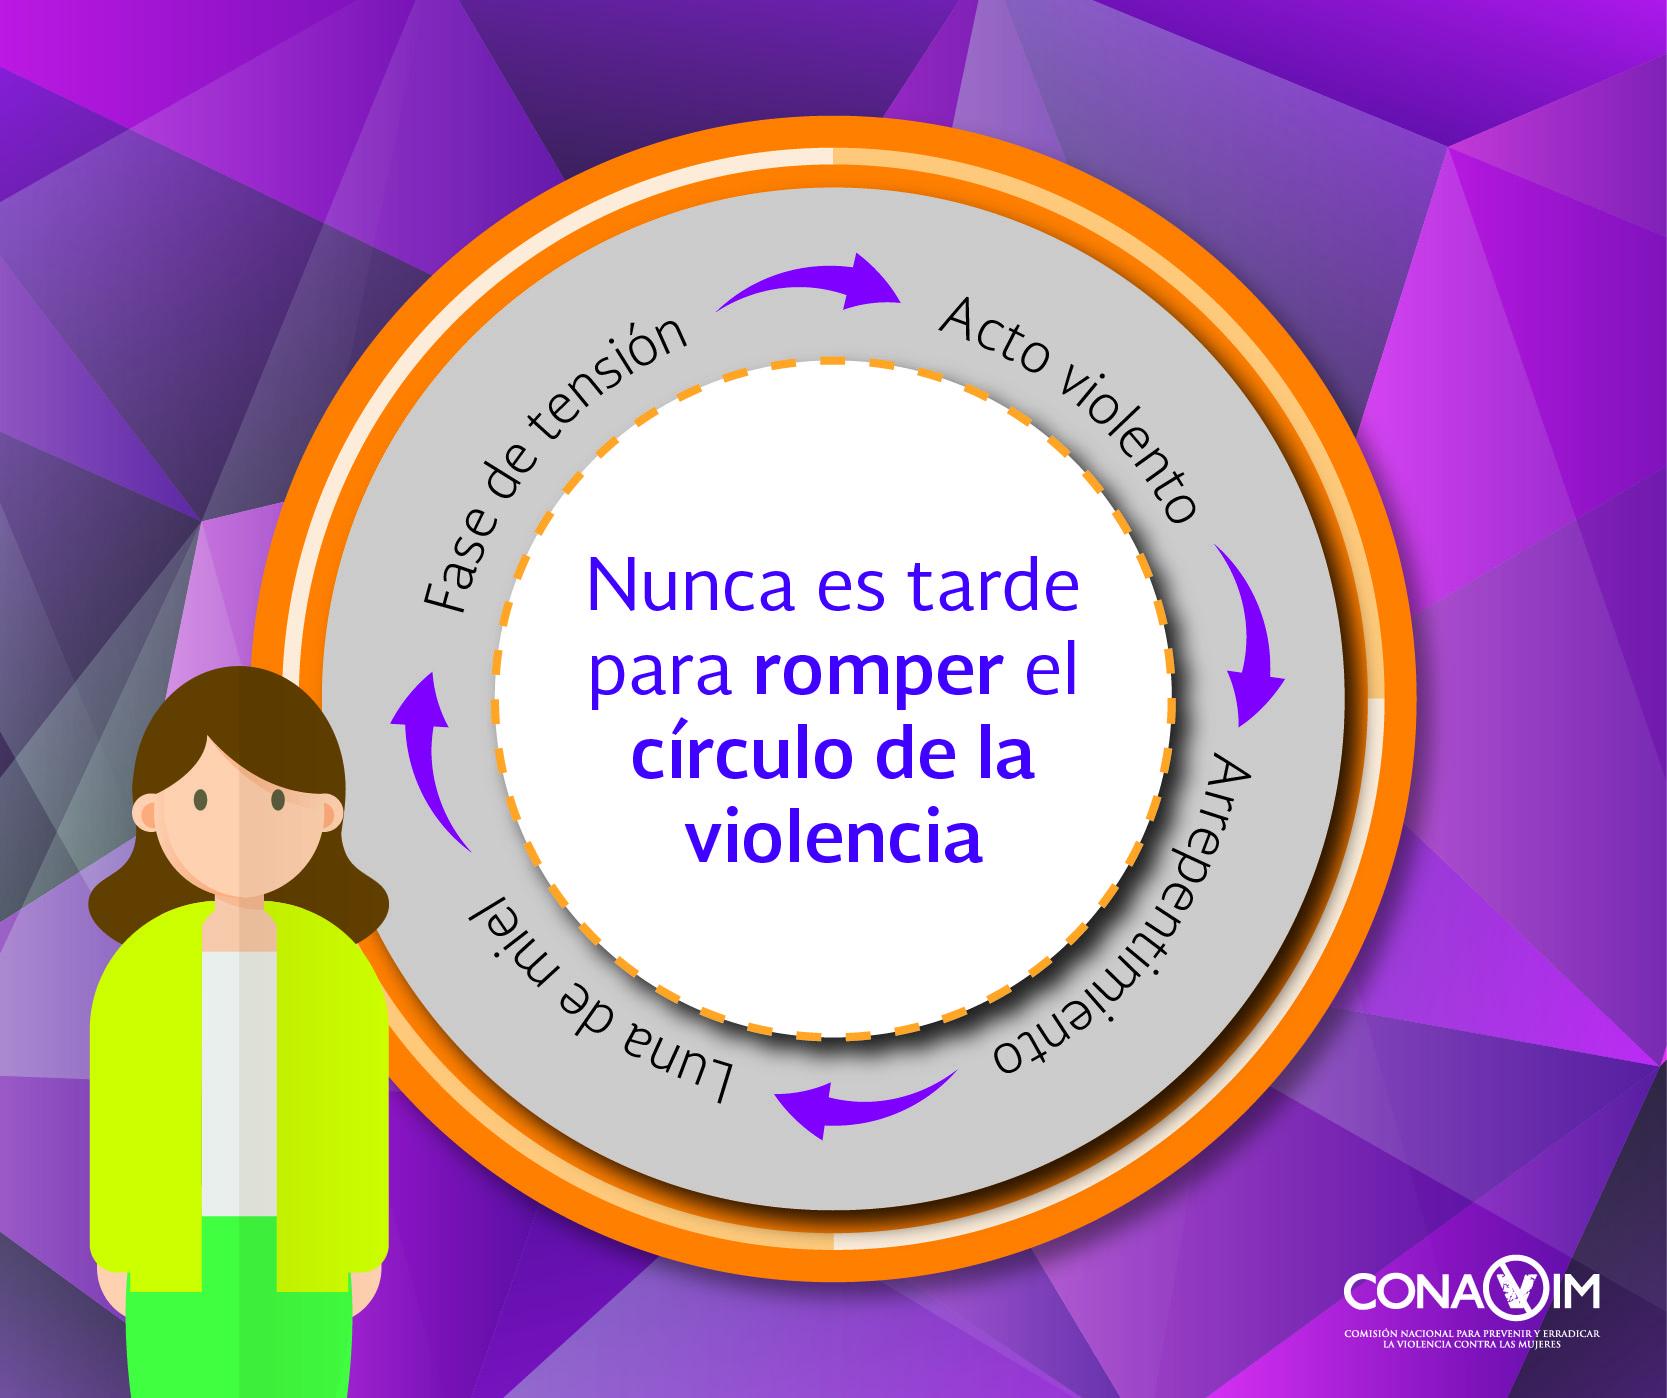 /cms/uploads/image/file/215048/Circulo_de_la_violencia-02.jpg